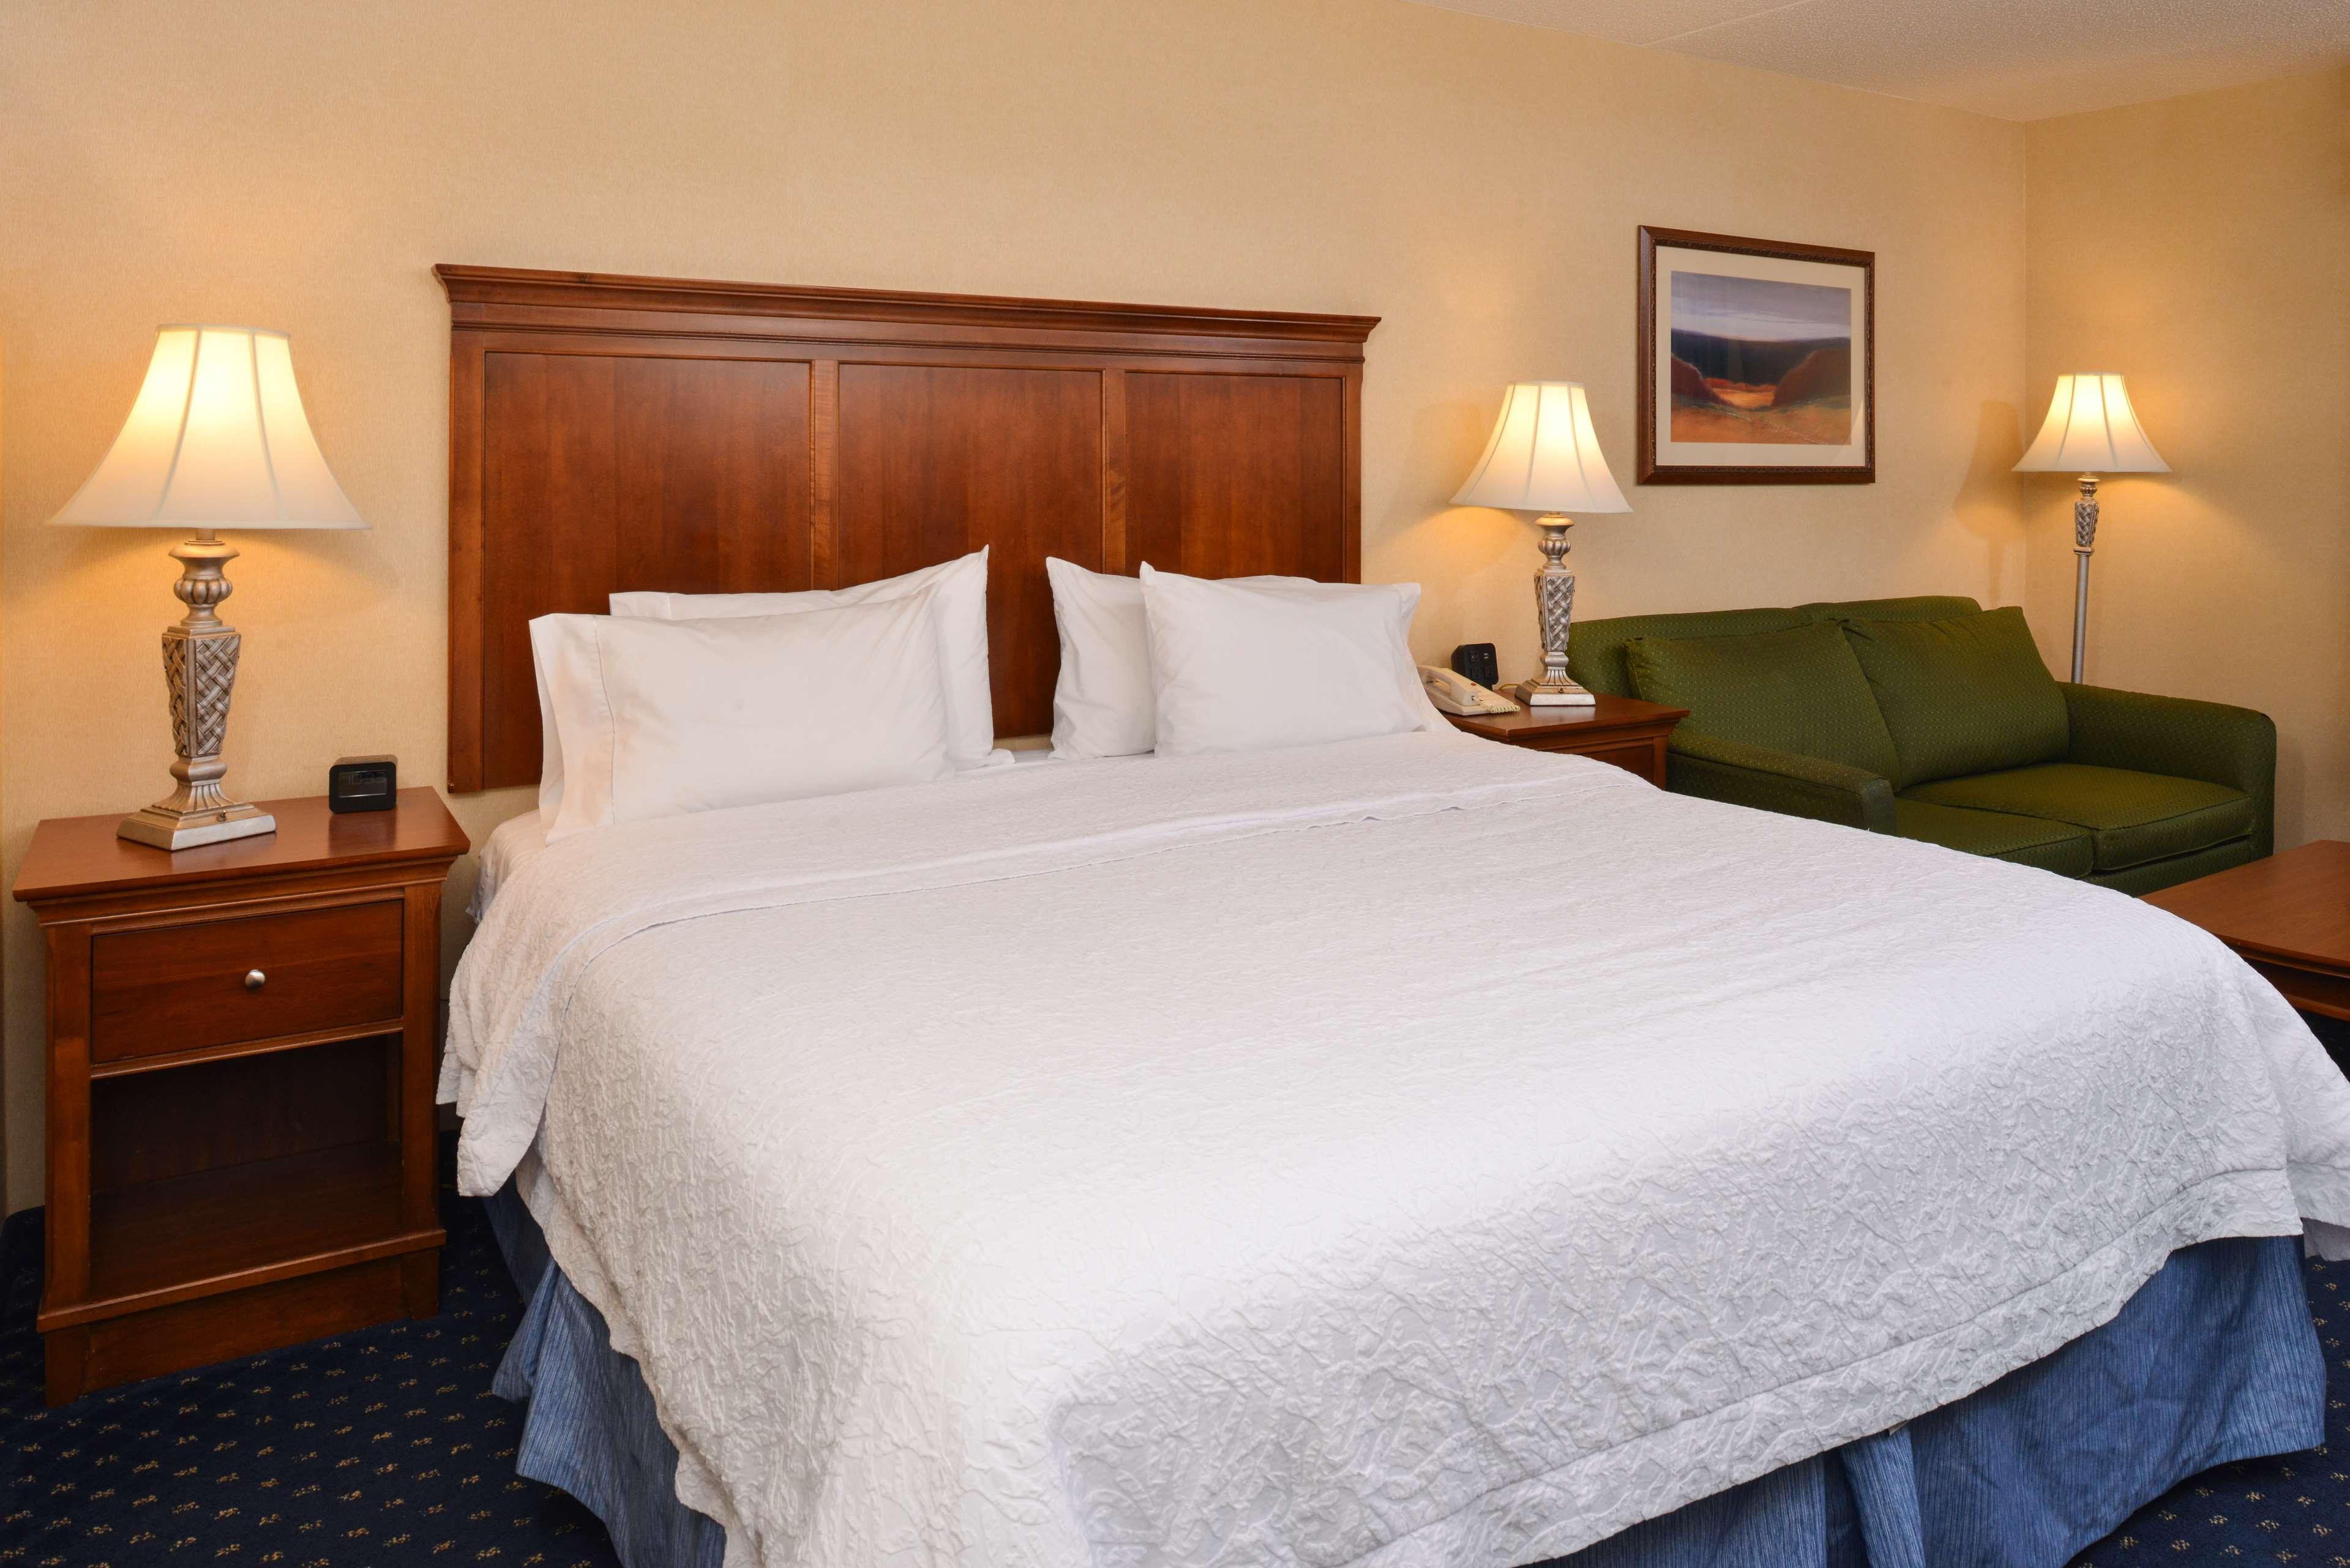 Hampton Inn & Suites Fredericksburg South image 23